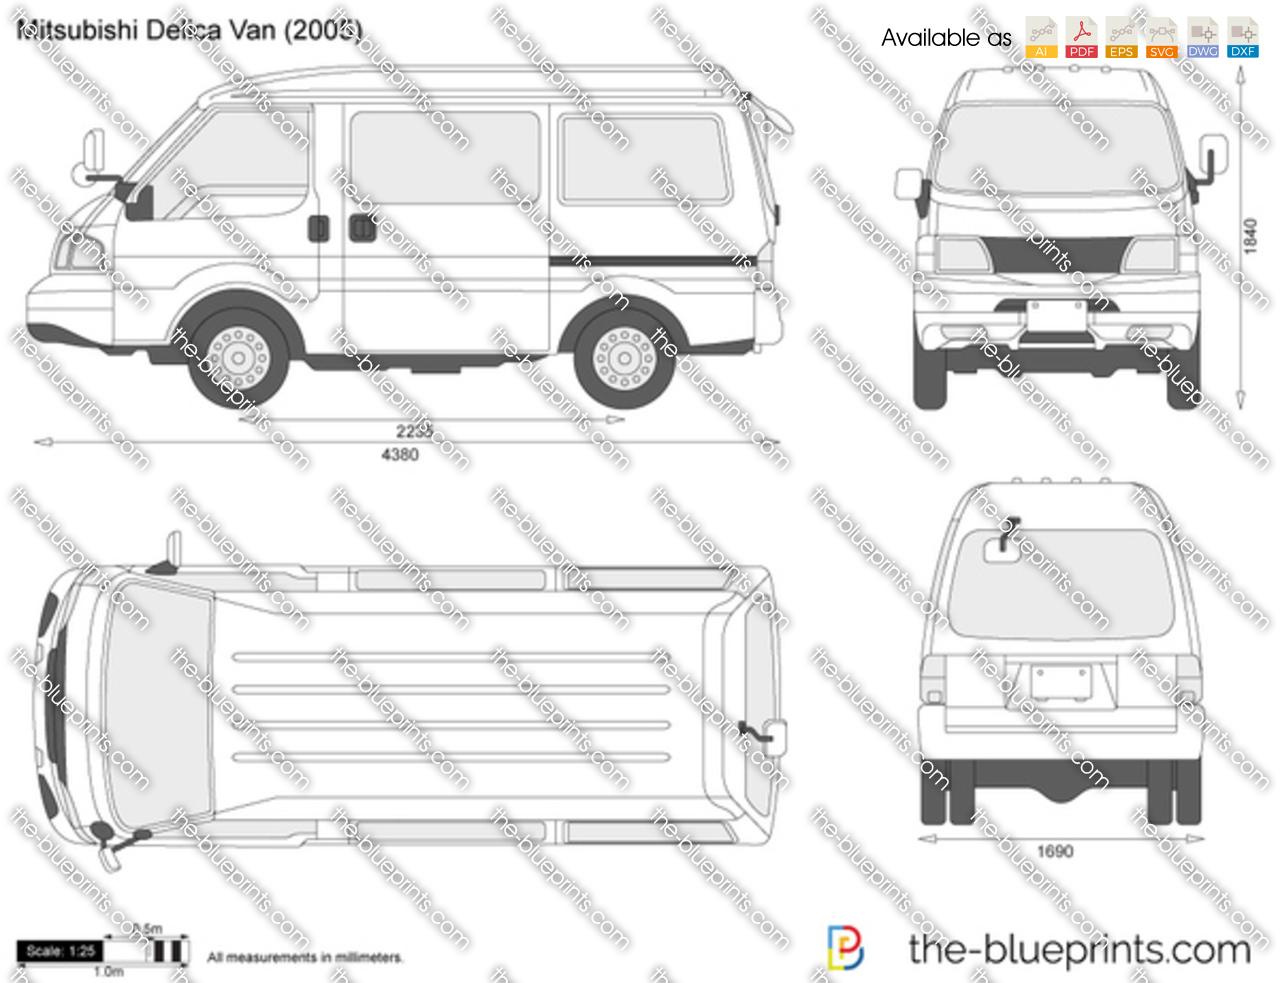 Mitsubishi Delica Van 2012